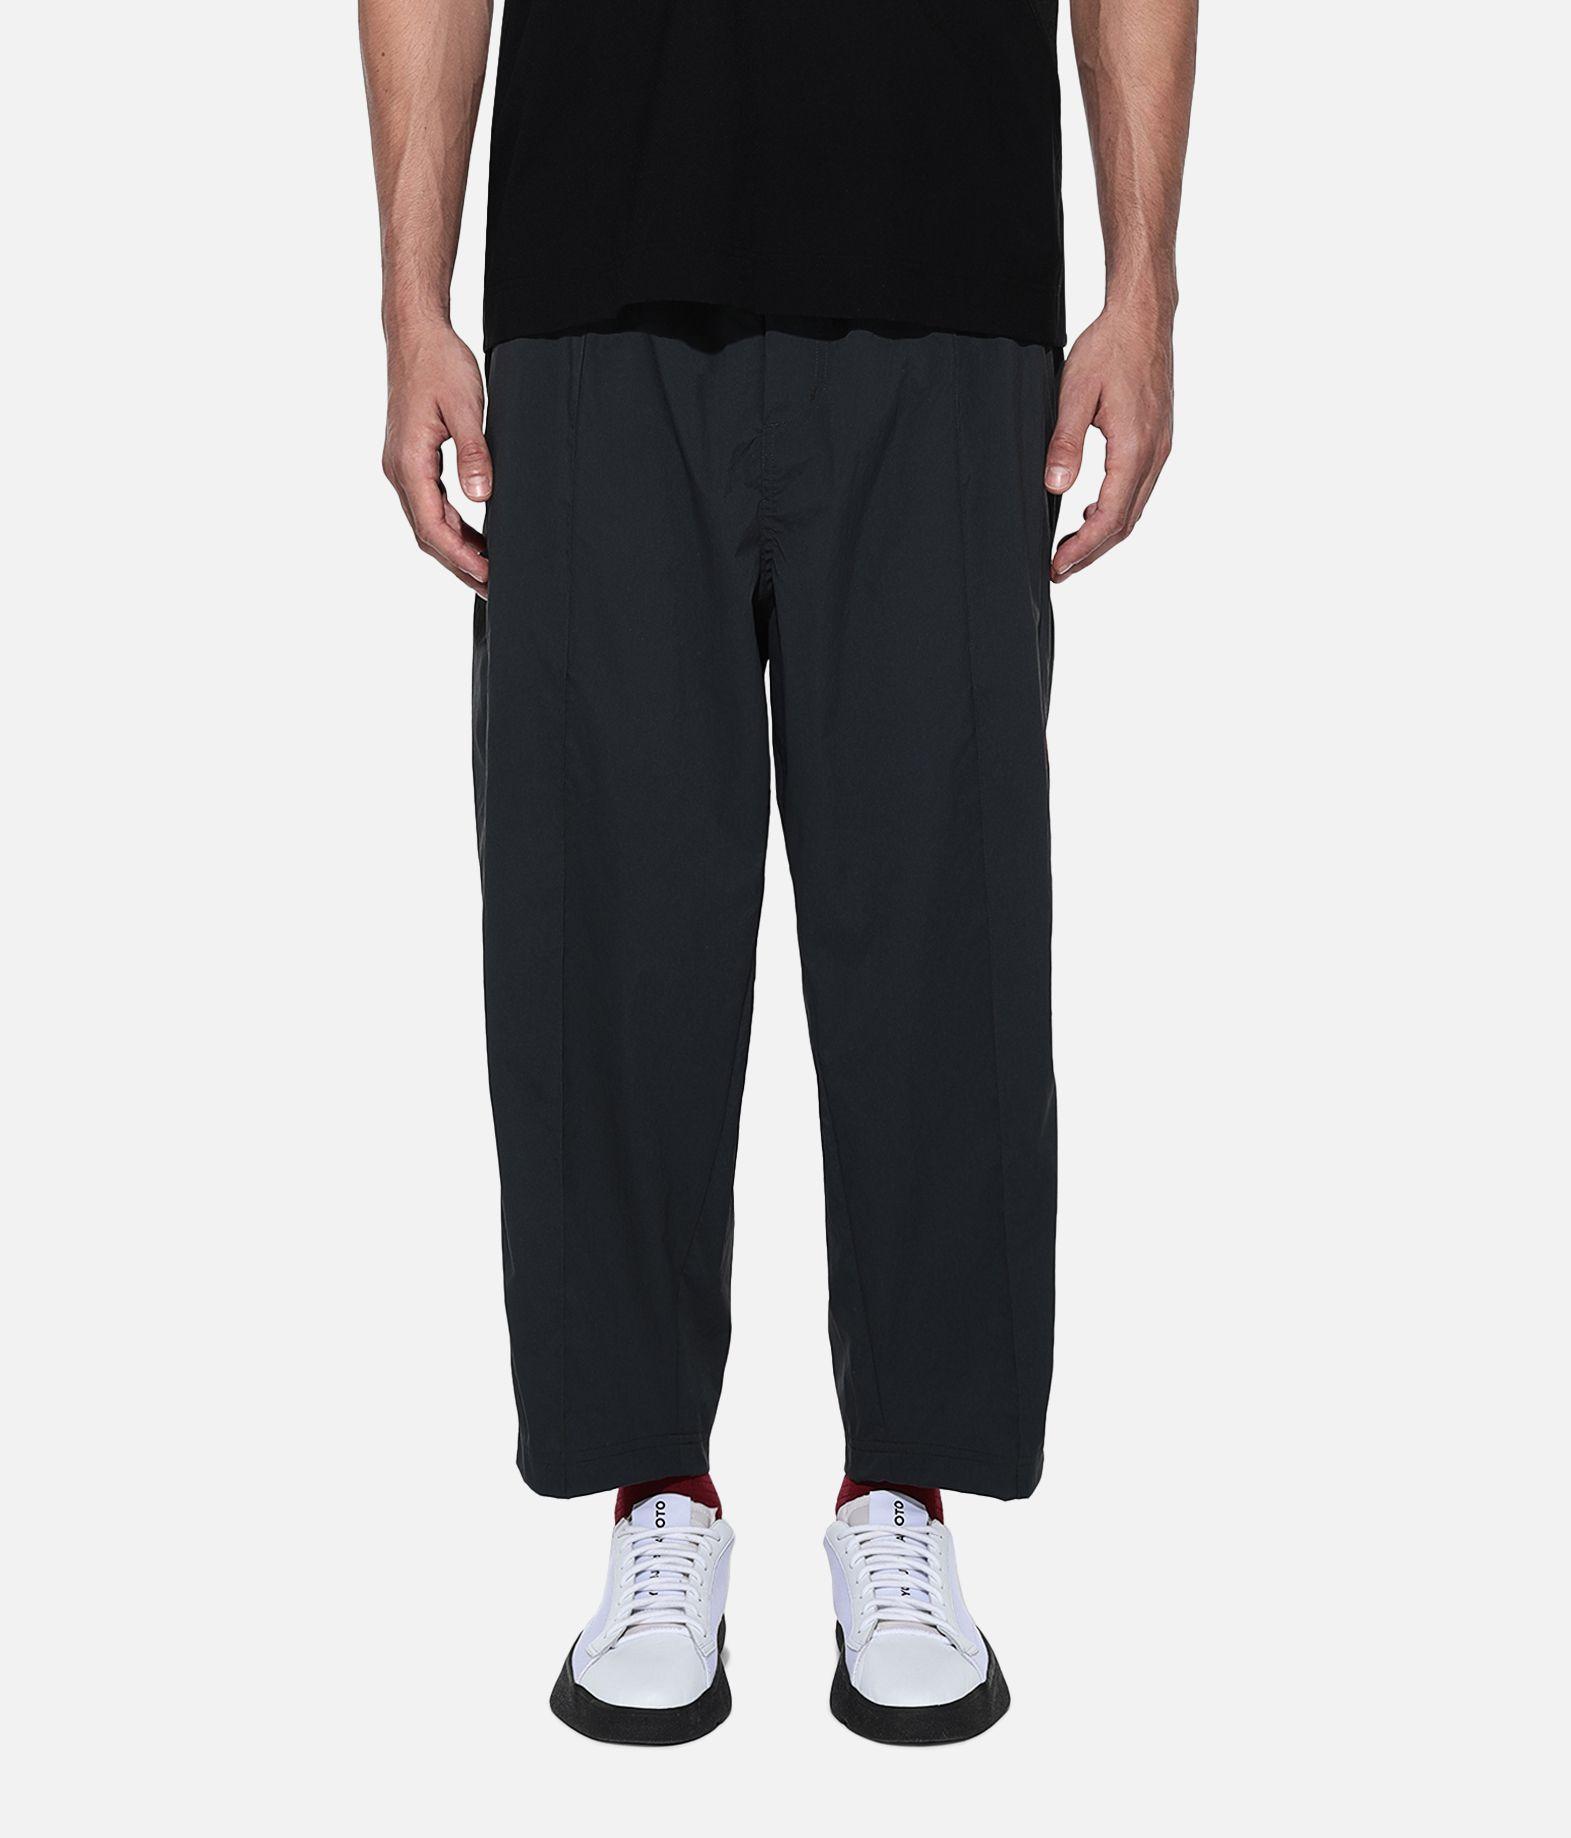 Y-3 Y-3 Luxe Track Pants Tracksuit pants Man r